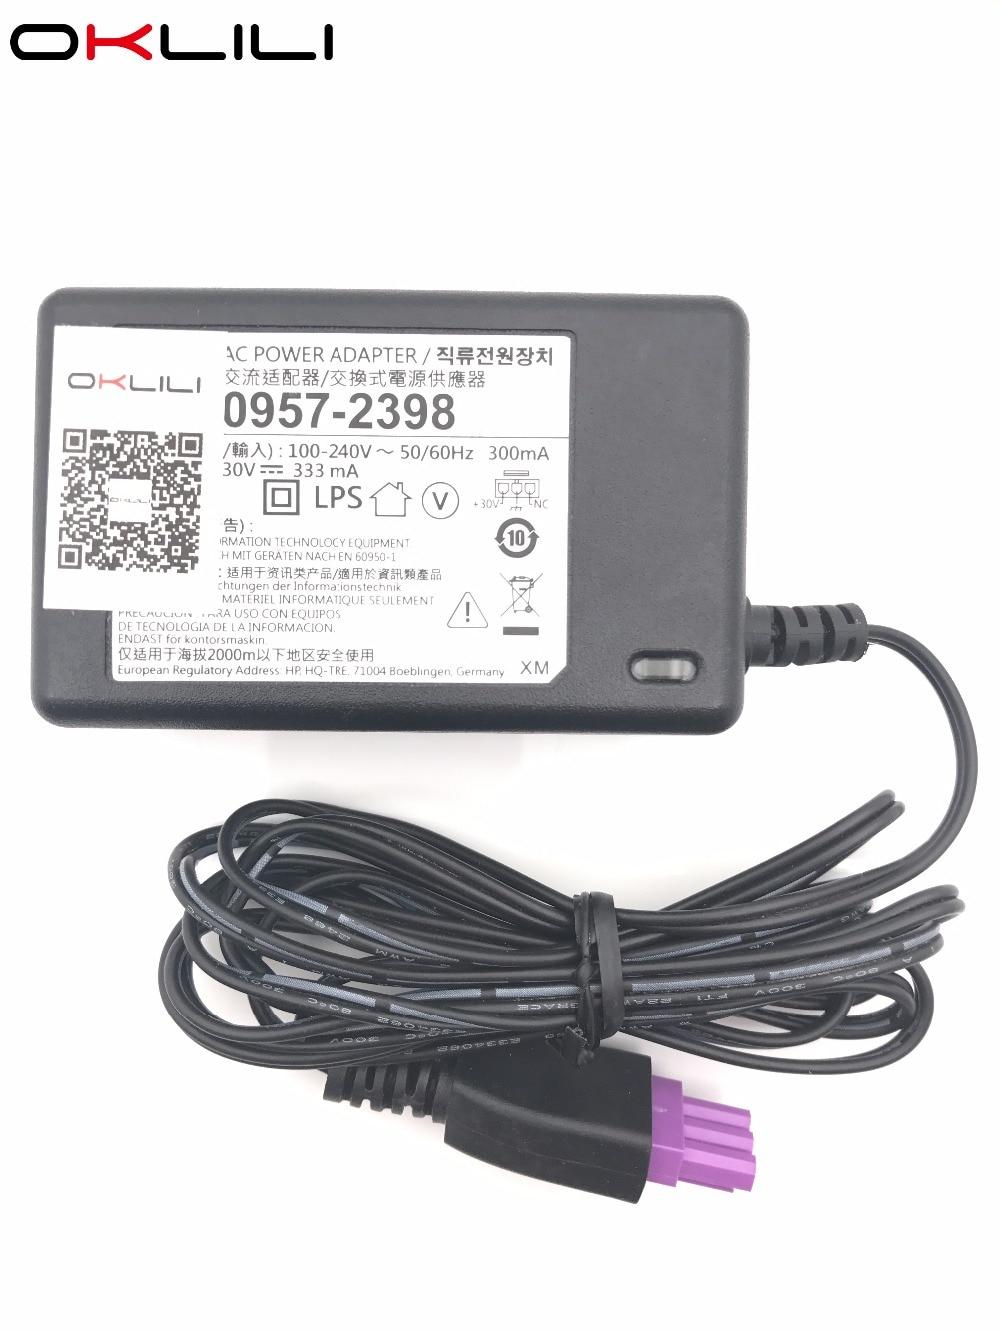 0957-2290 0957-2286 0957-2398 AC punjač 100-240V 50 / 60Hz 300mA 30V - Uredska elektronika - Foto 2